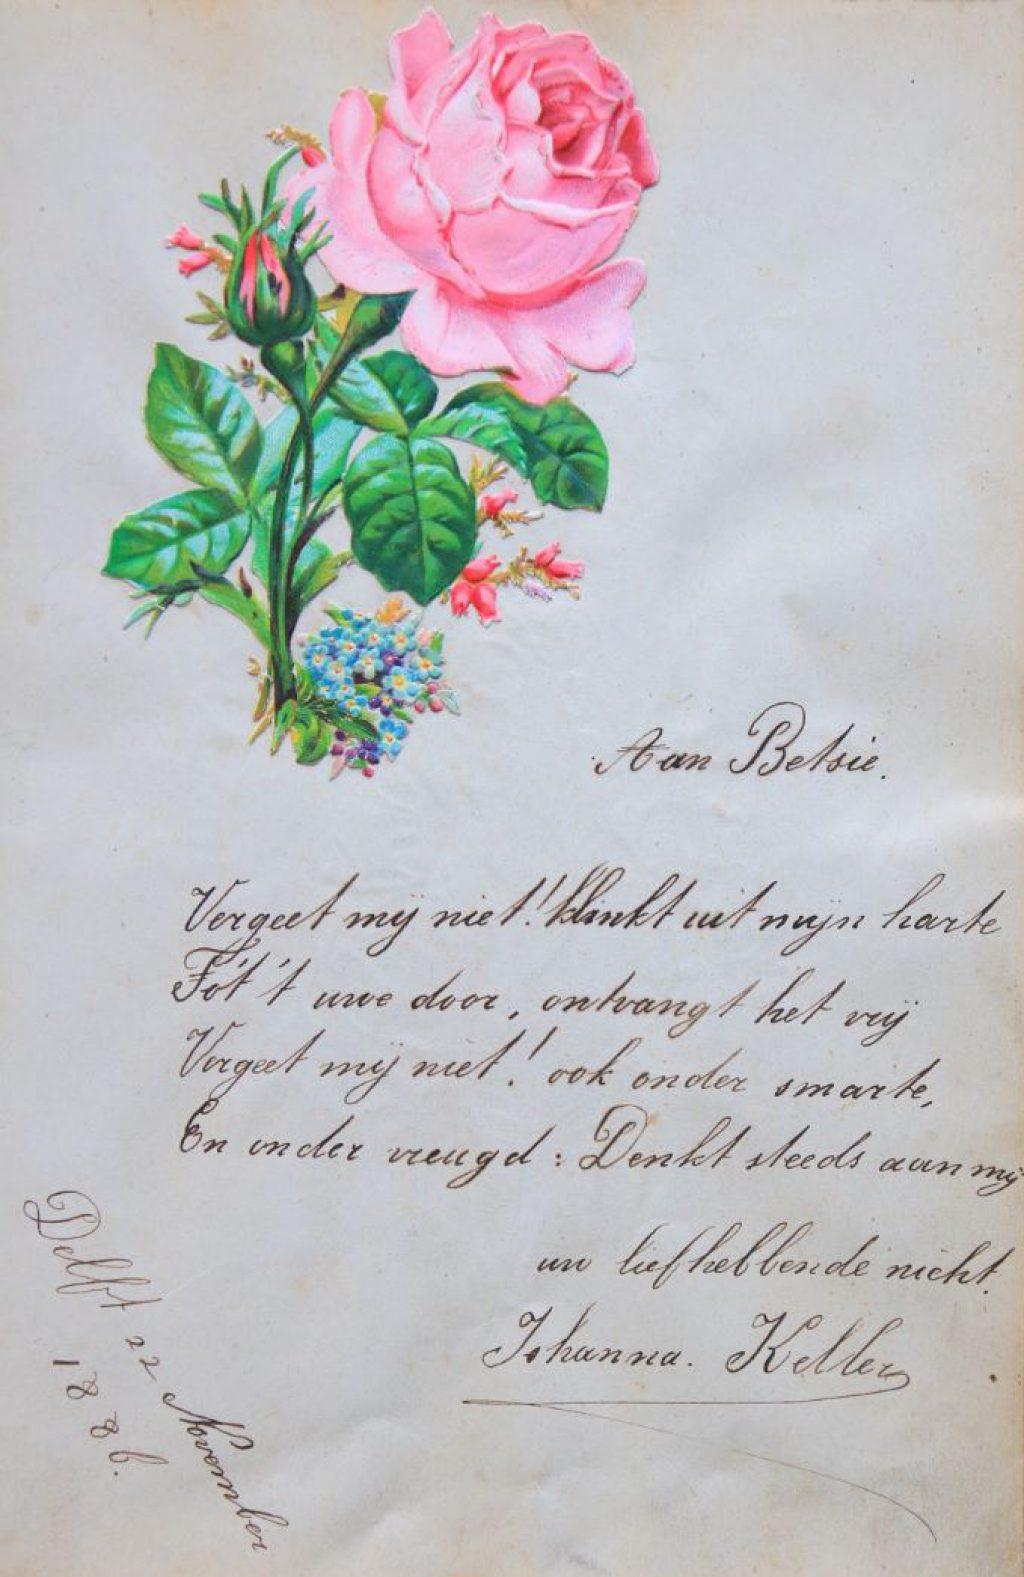 Poëziealbum van Betsie Eterman, ca. 1886-1896 (Archief 598, inv.nr 563)